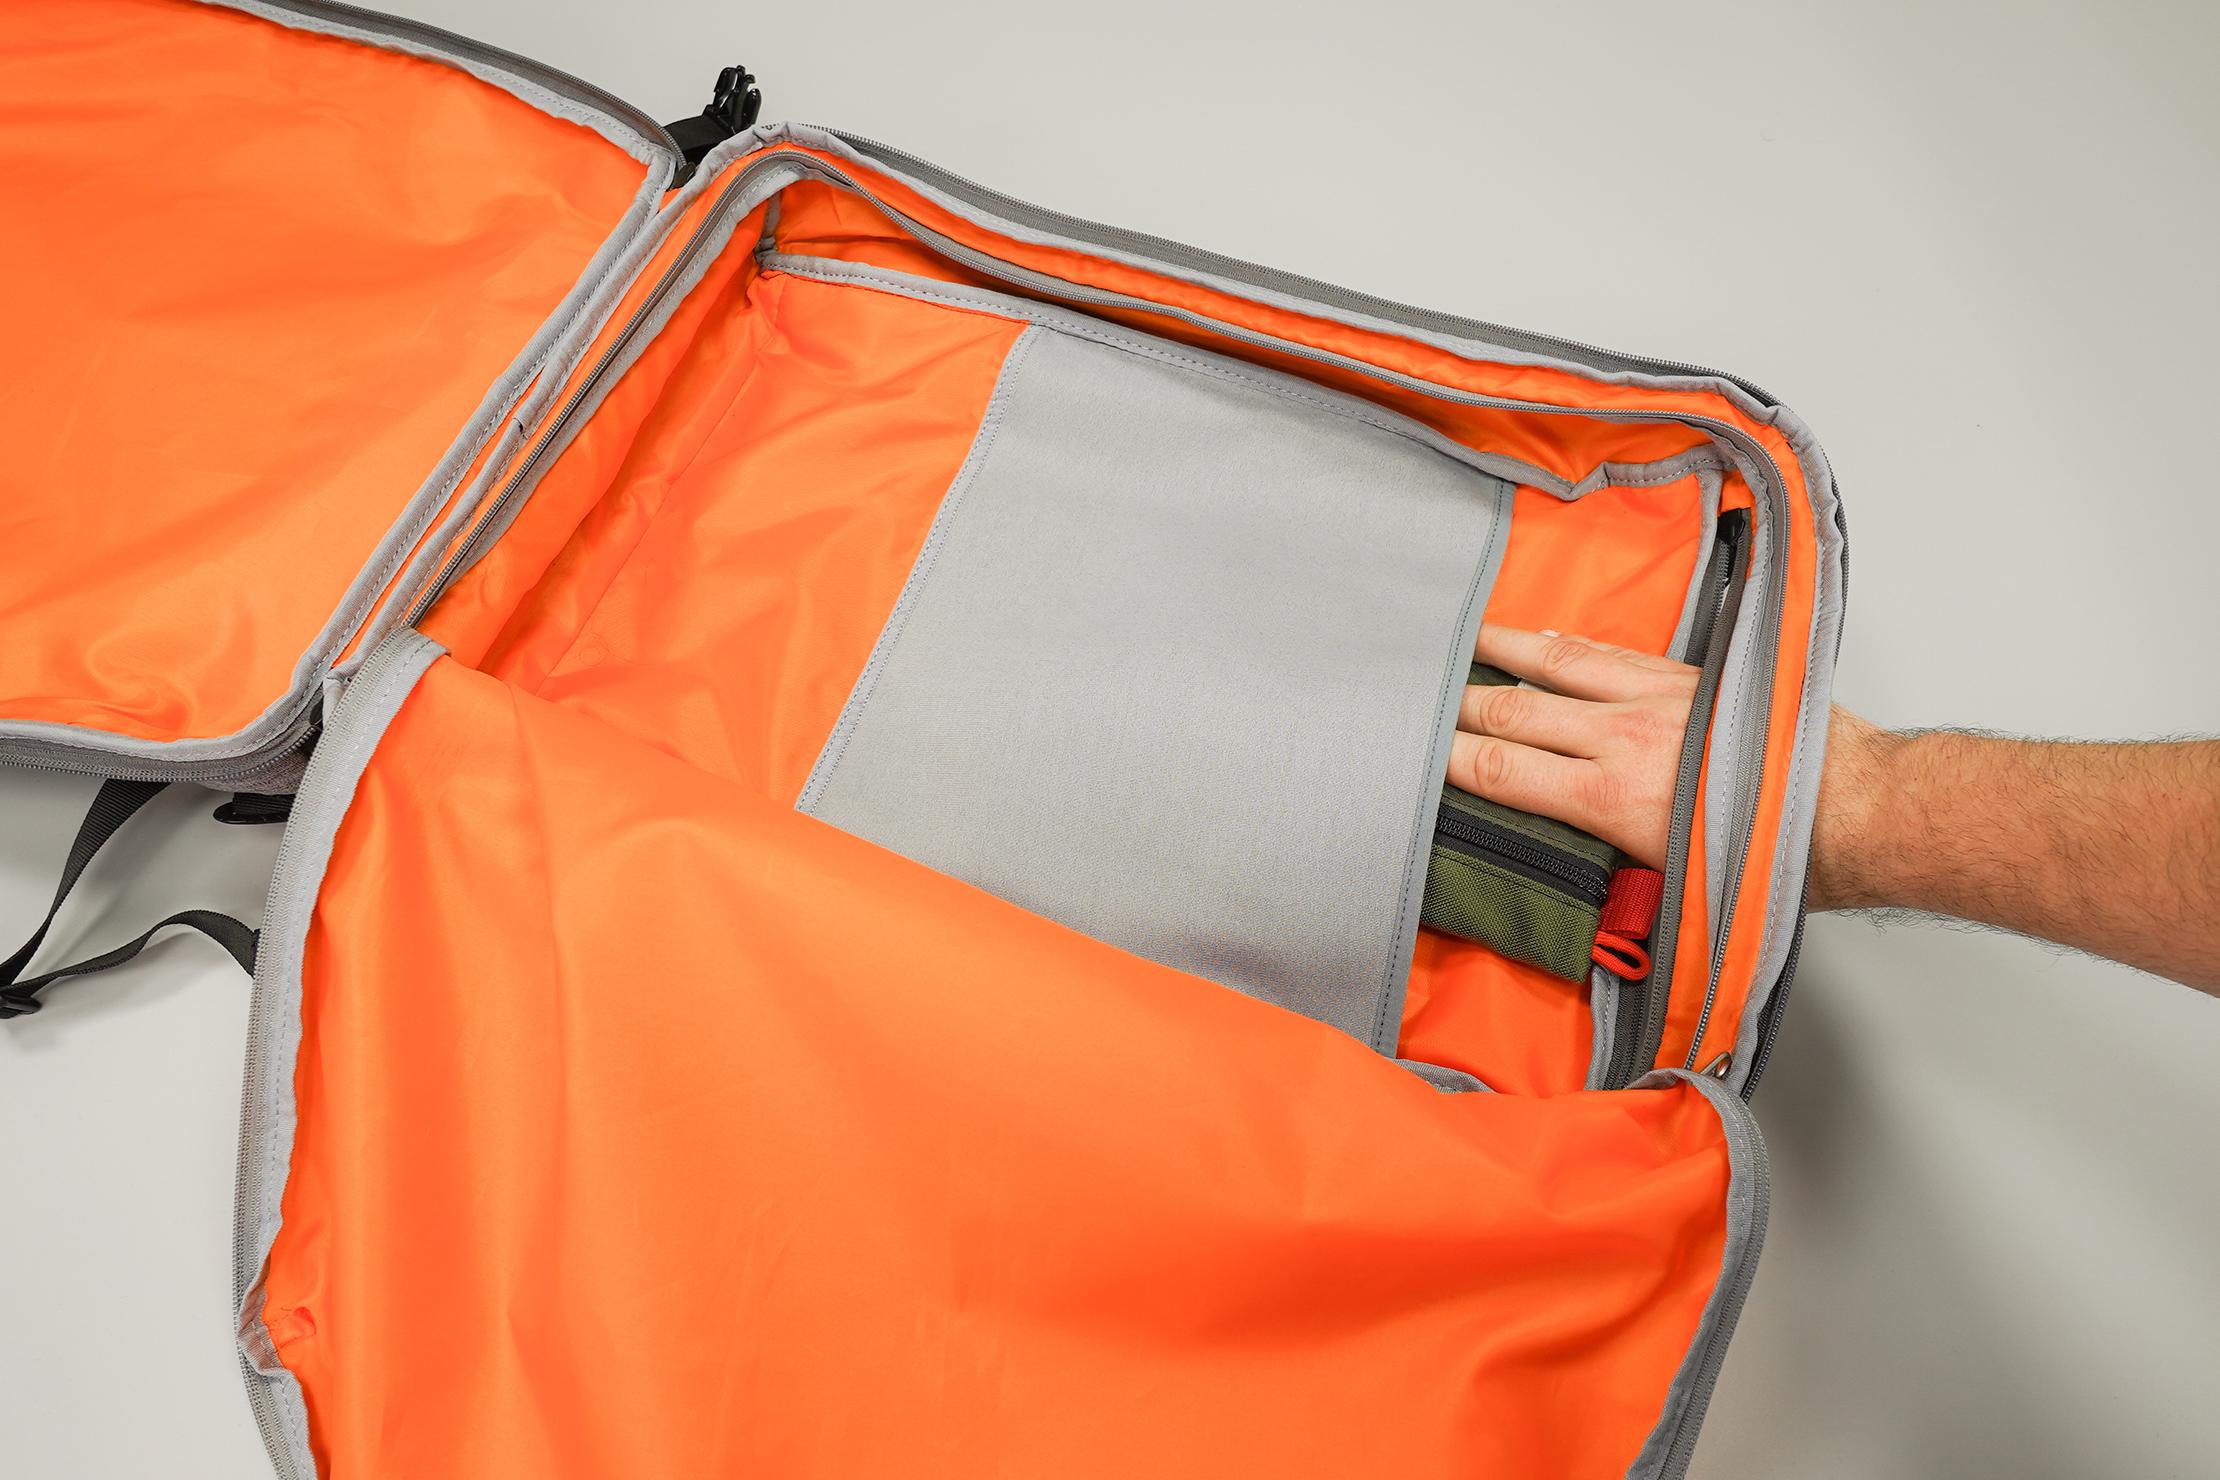 AmazonBasics Slim Travel Backpack Weekender Main Compartment Zipper Access